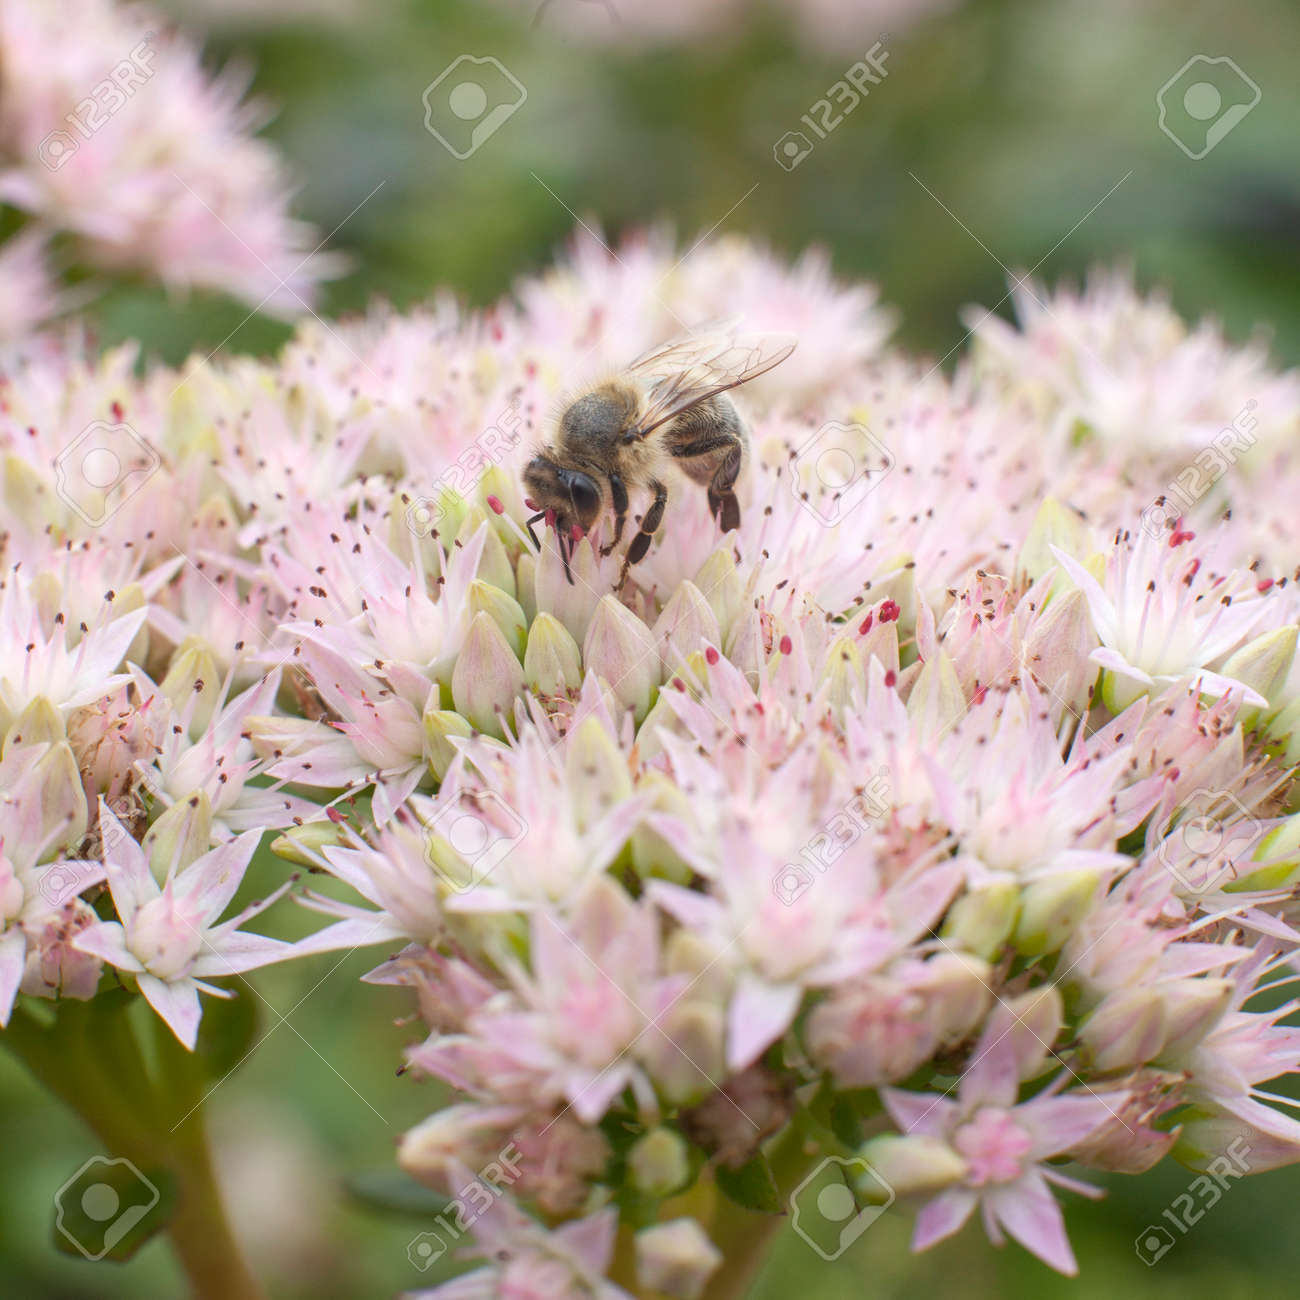 Bee Collecting Nectar On Light Pink Flower Of Sedum Stock Photo